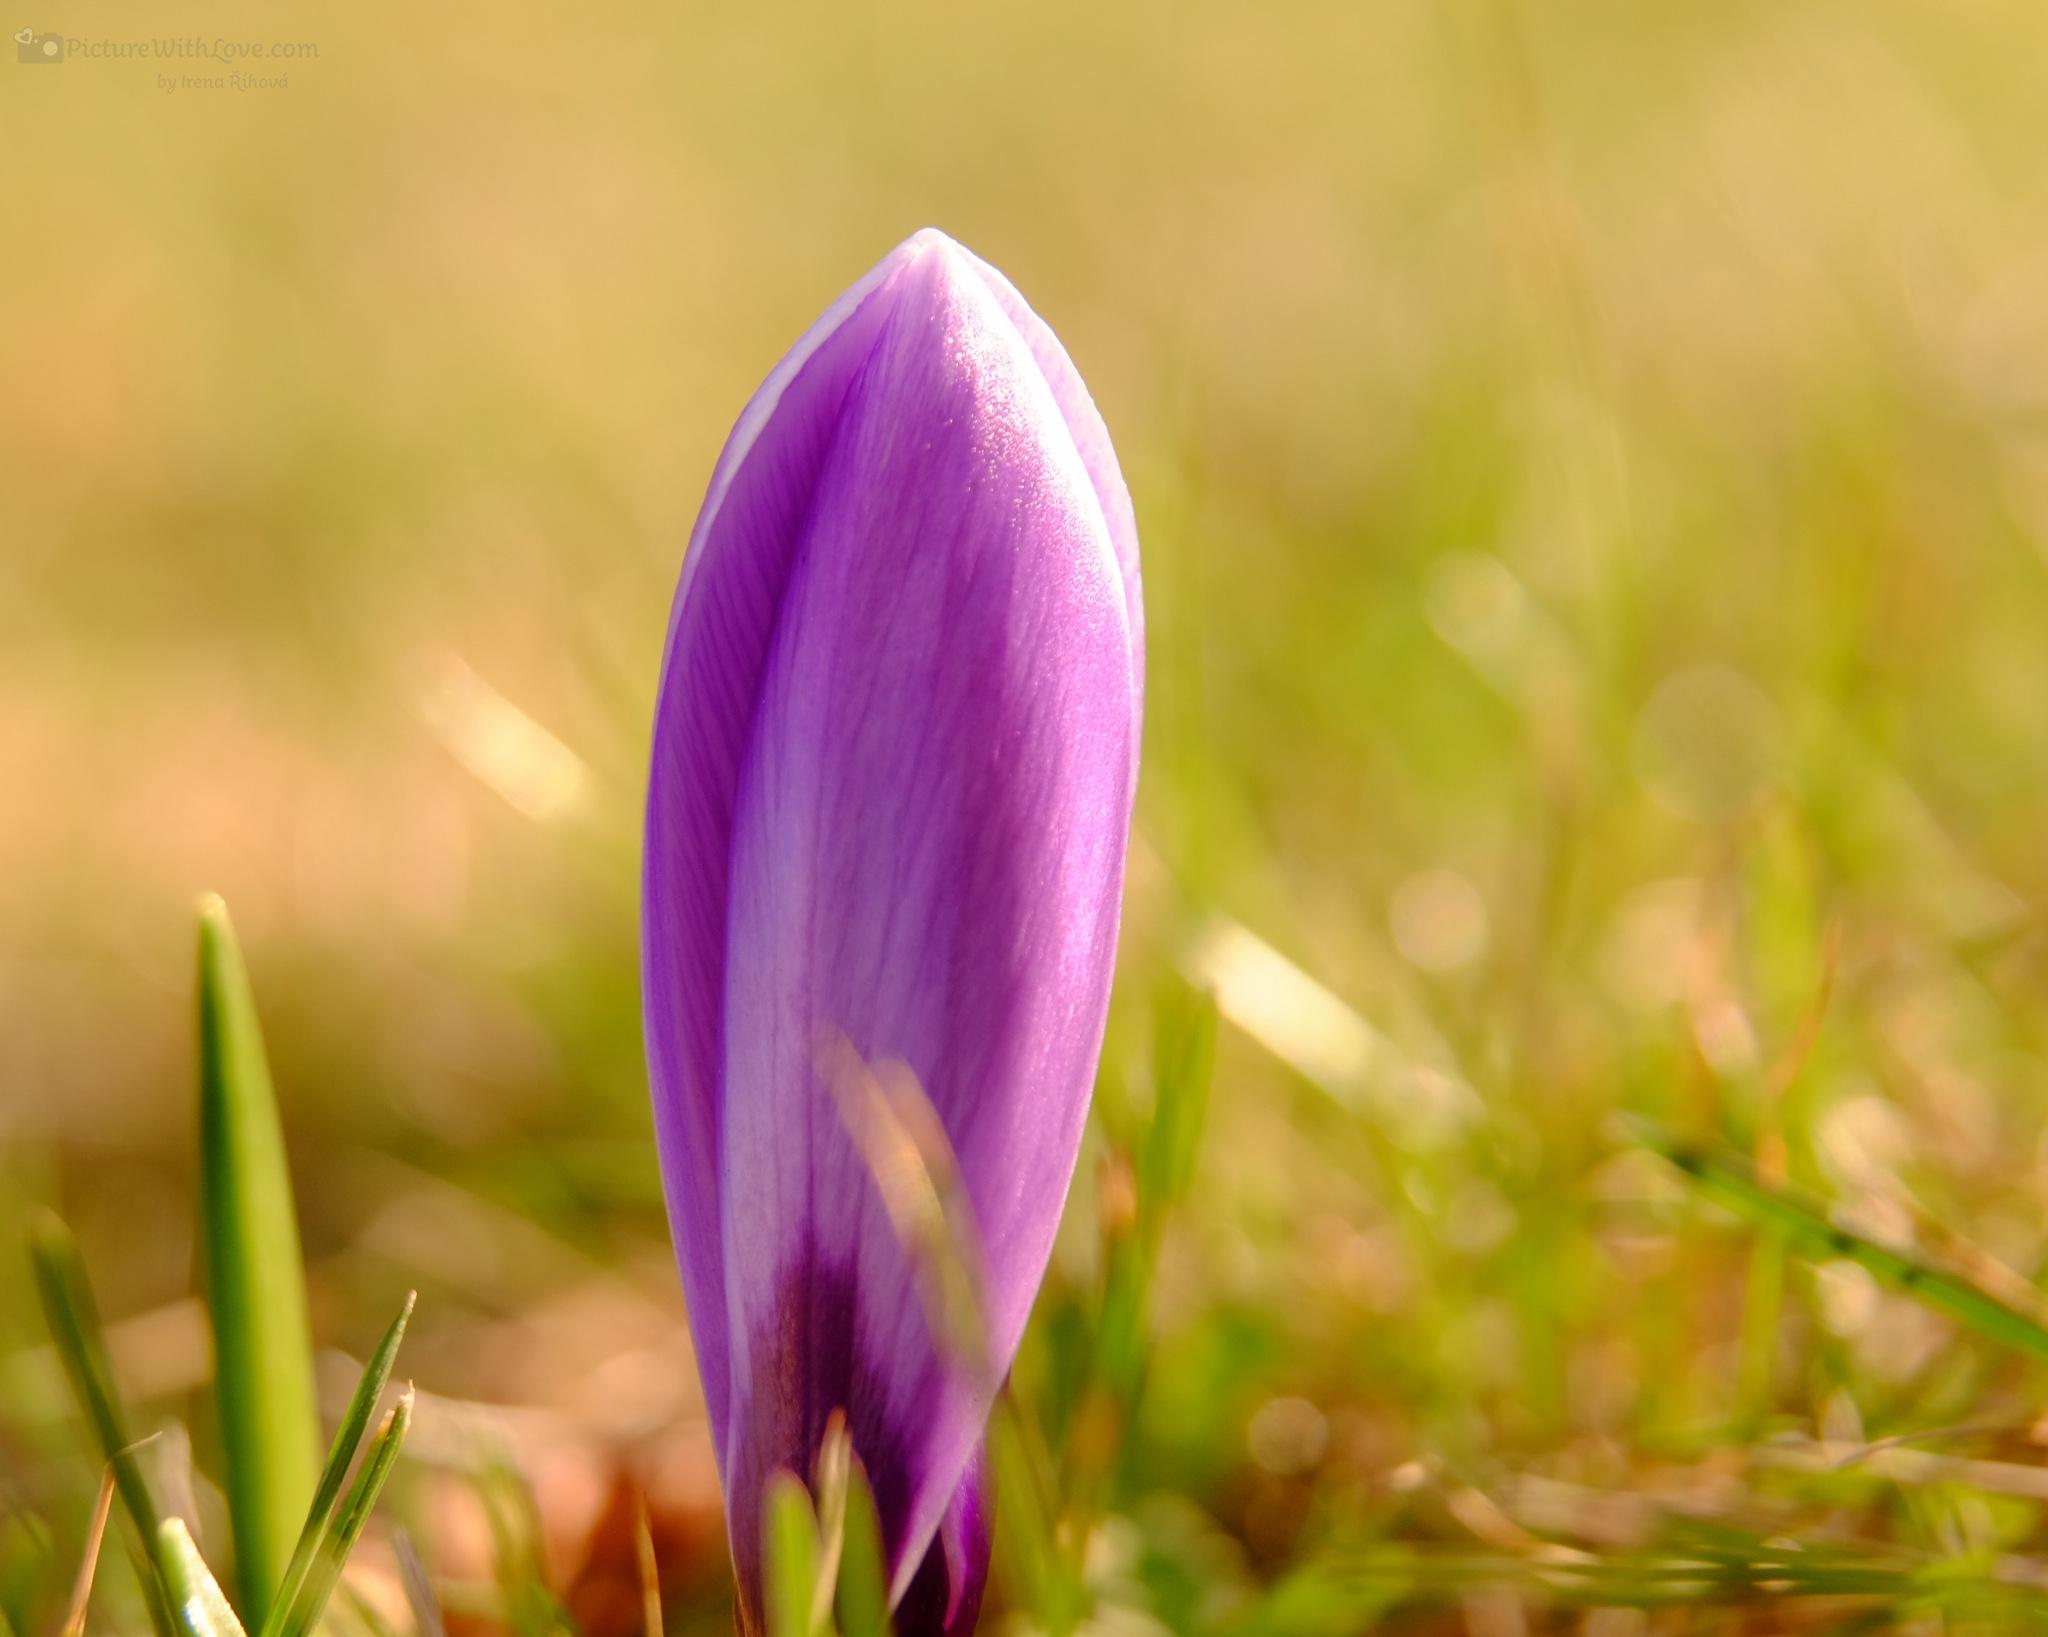 Blossom of Crocus by Irena Rihova